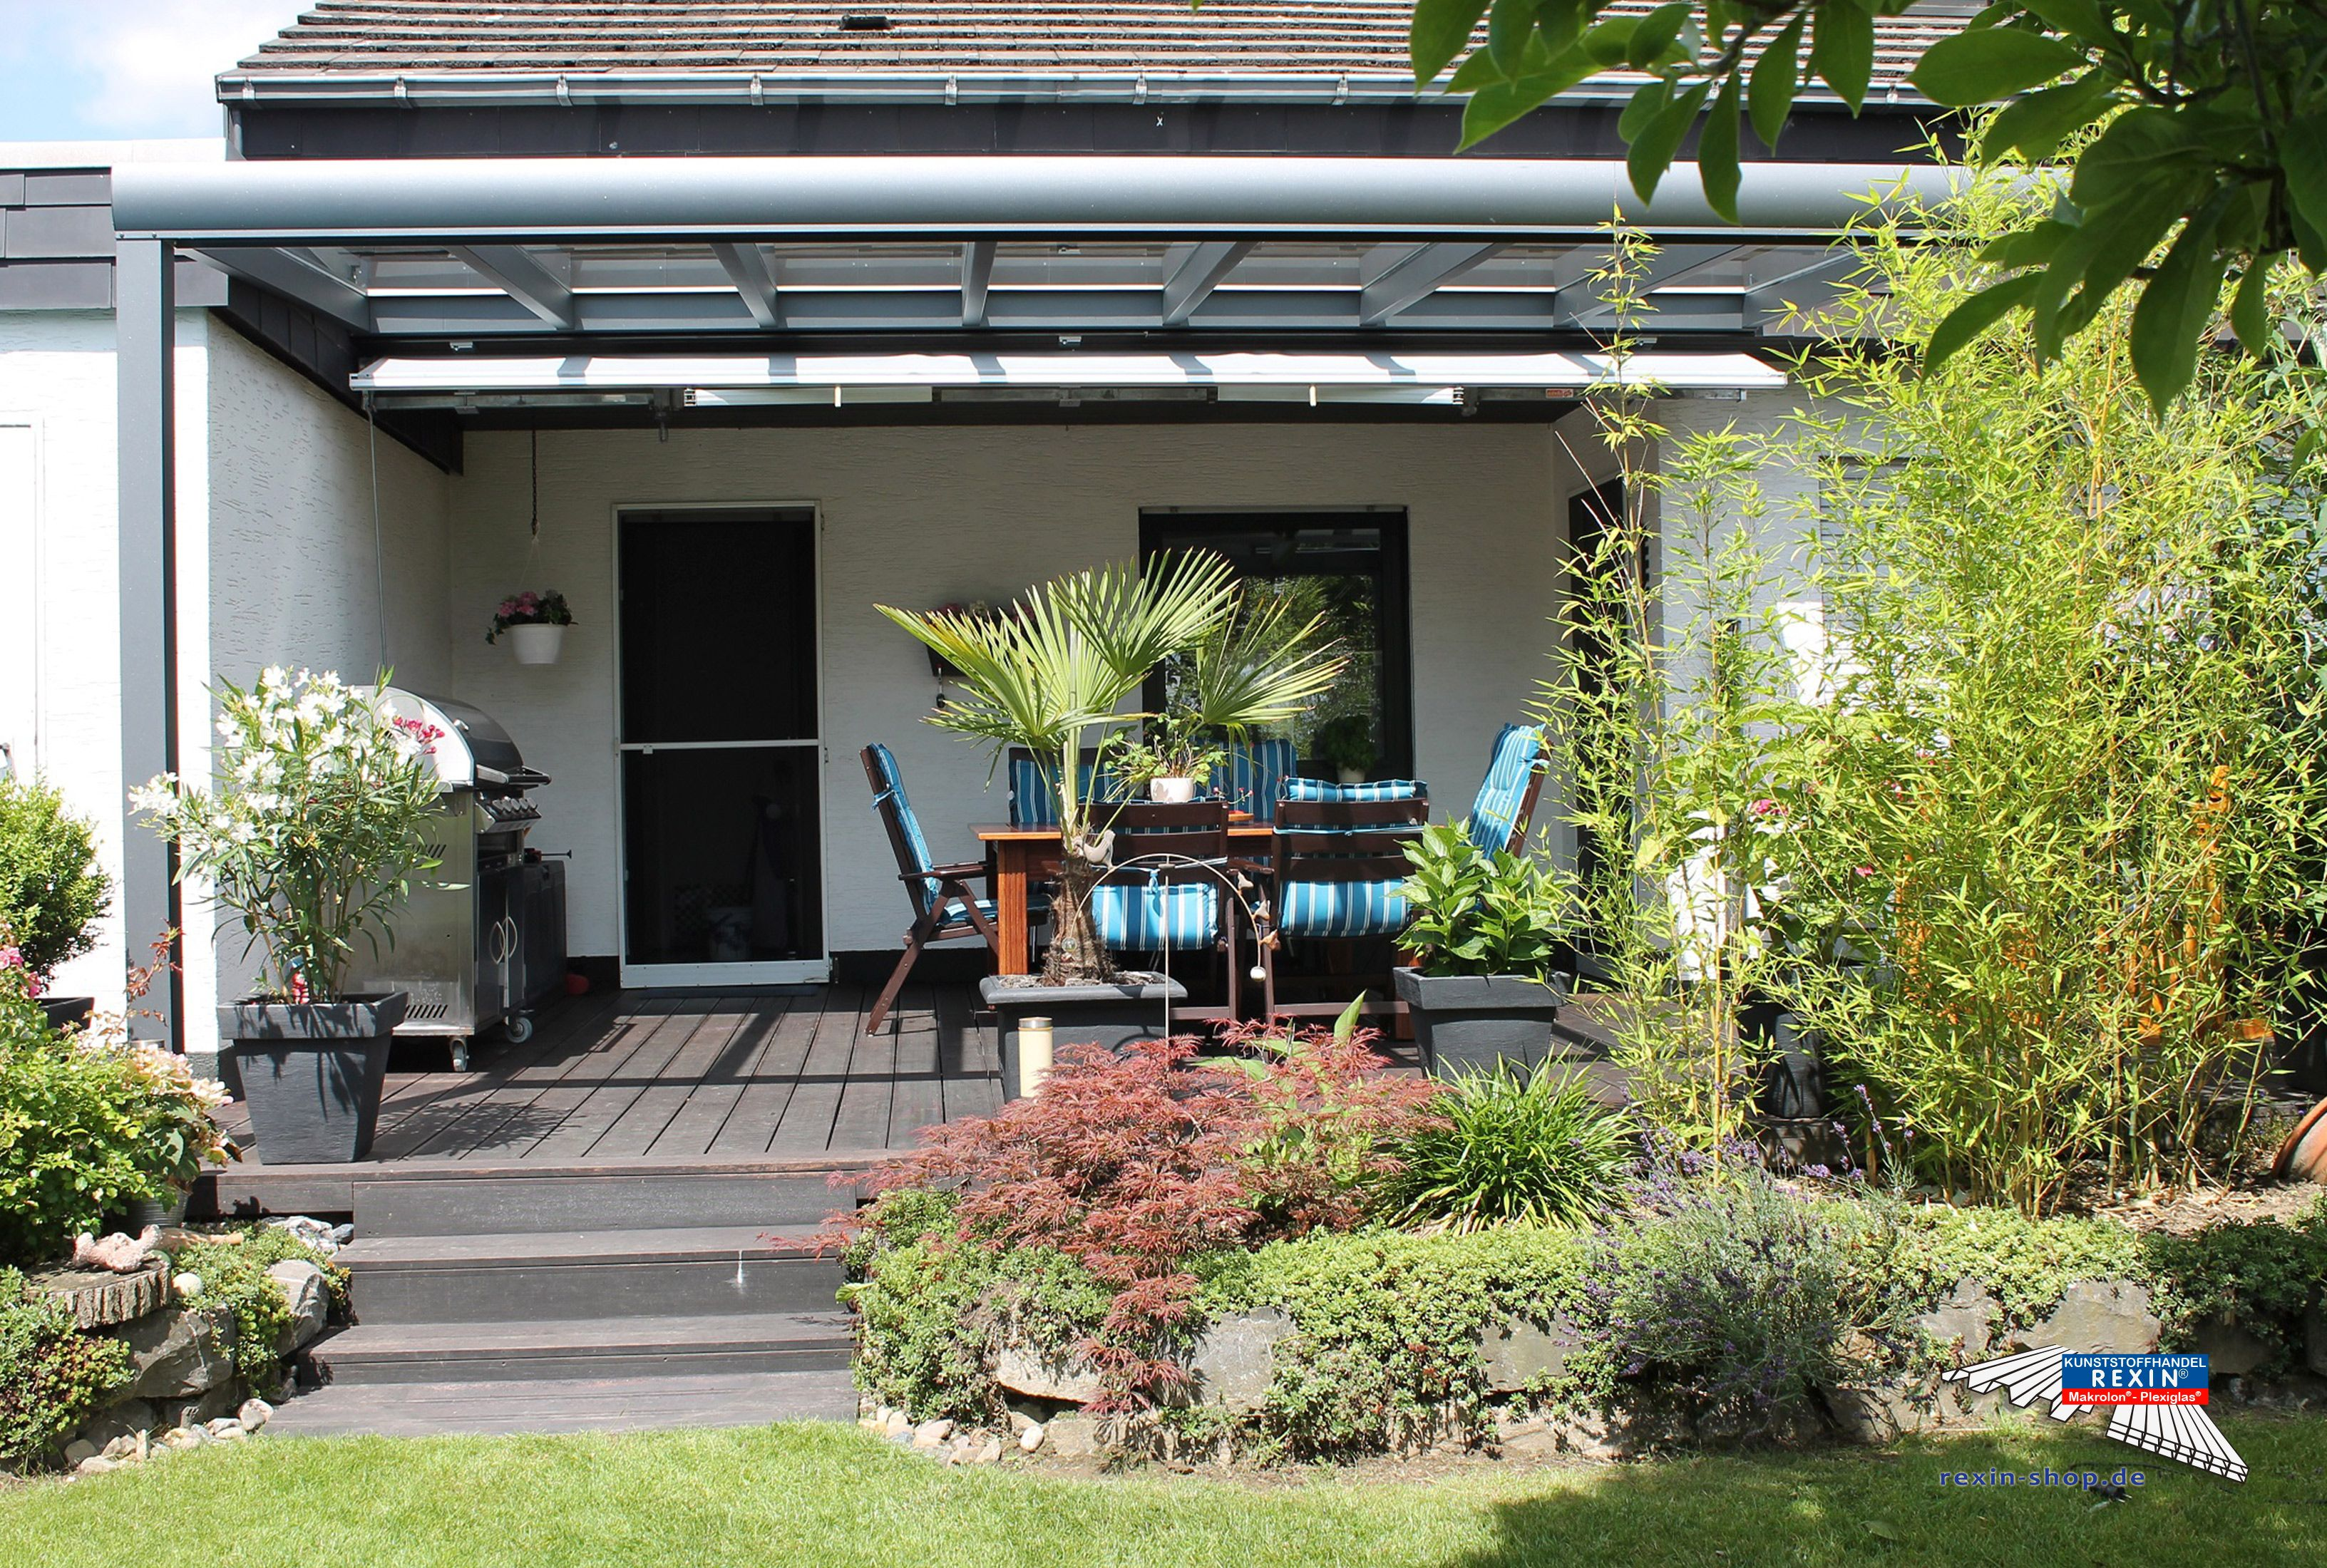 Terrassendach Aus Aluminium Mit Vsg Glas Kompl Neu ~ Alu terrassenüberdachung mm glas vsg terrassendach carport